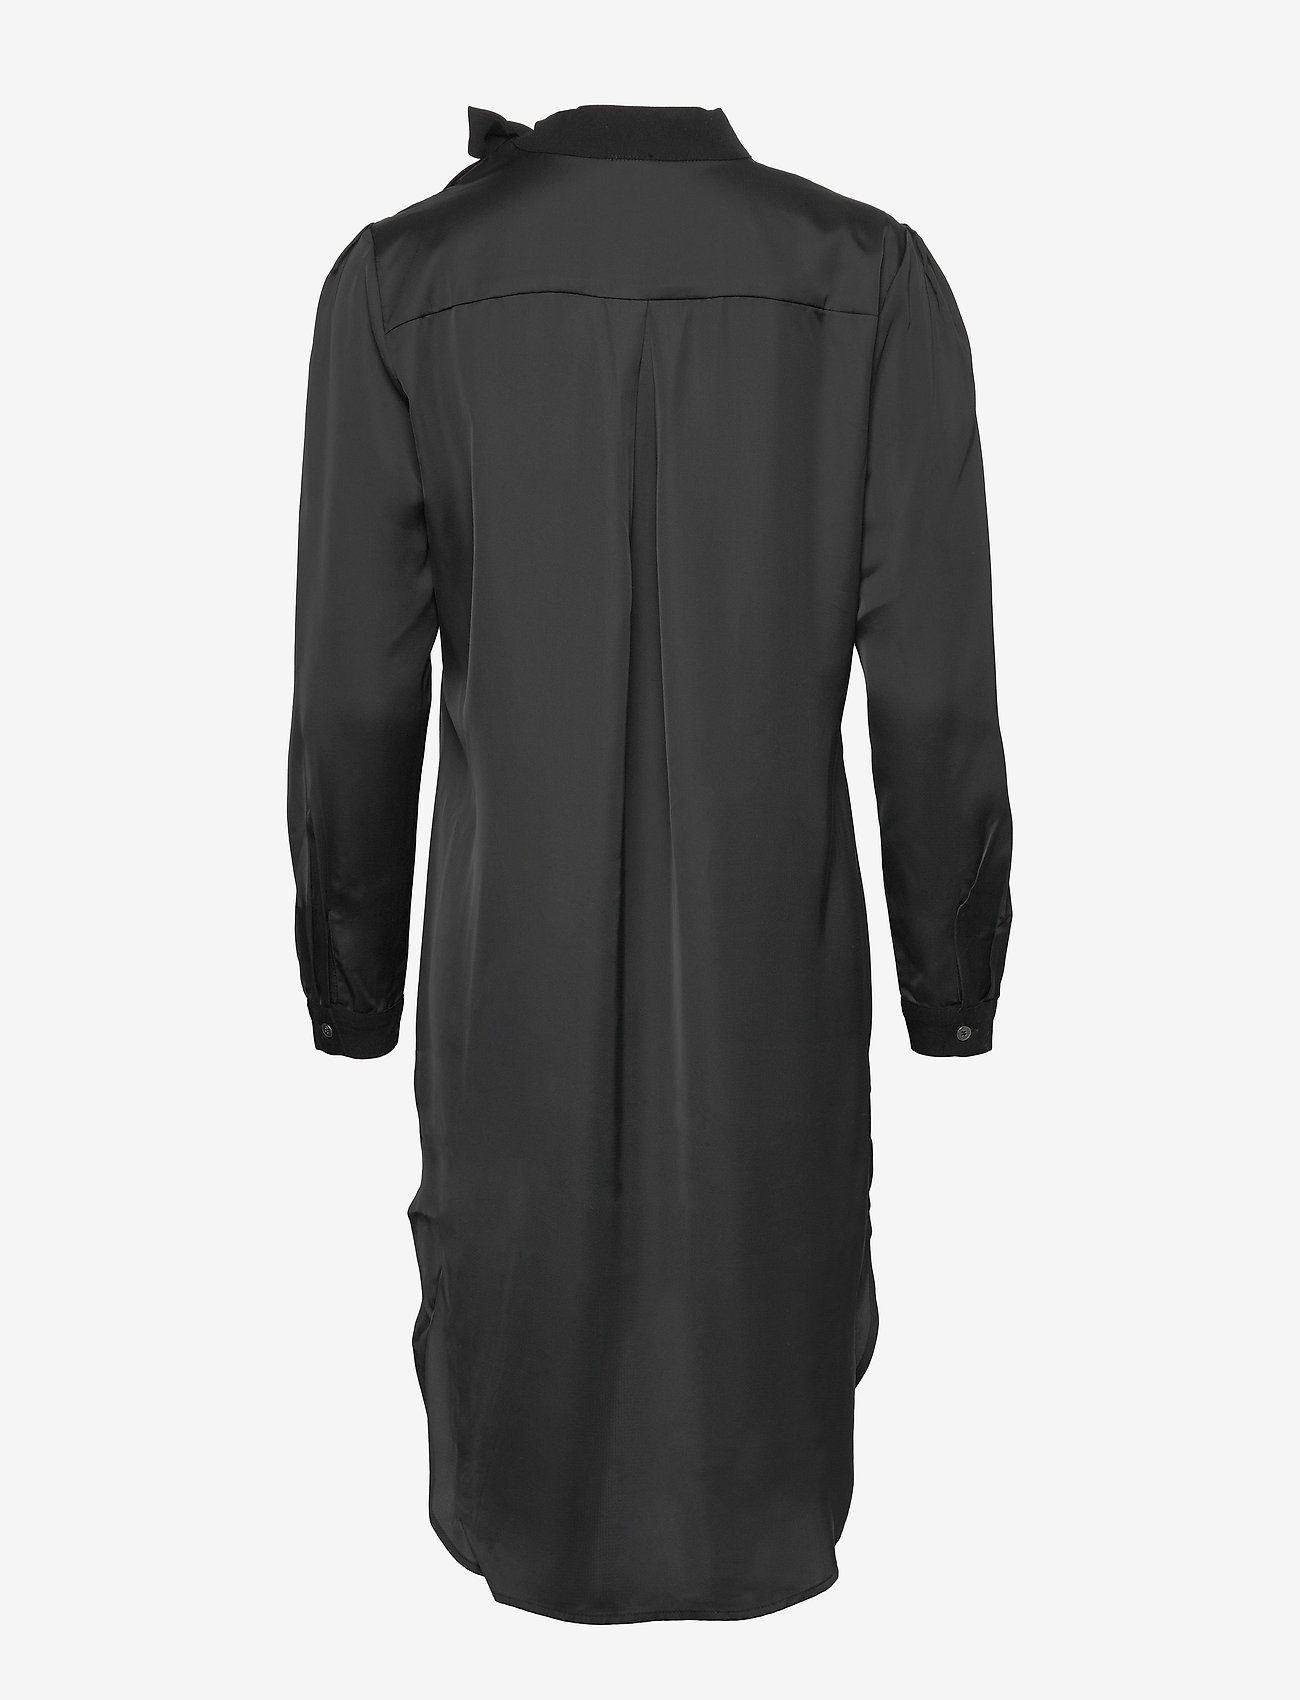 Ciar Tunic (Black) (69.98 €) - NÜ Denmark 4LkYv